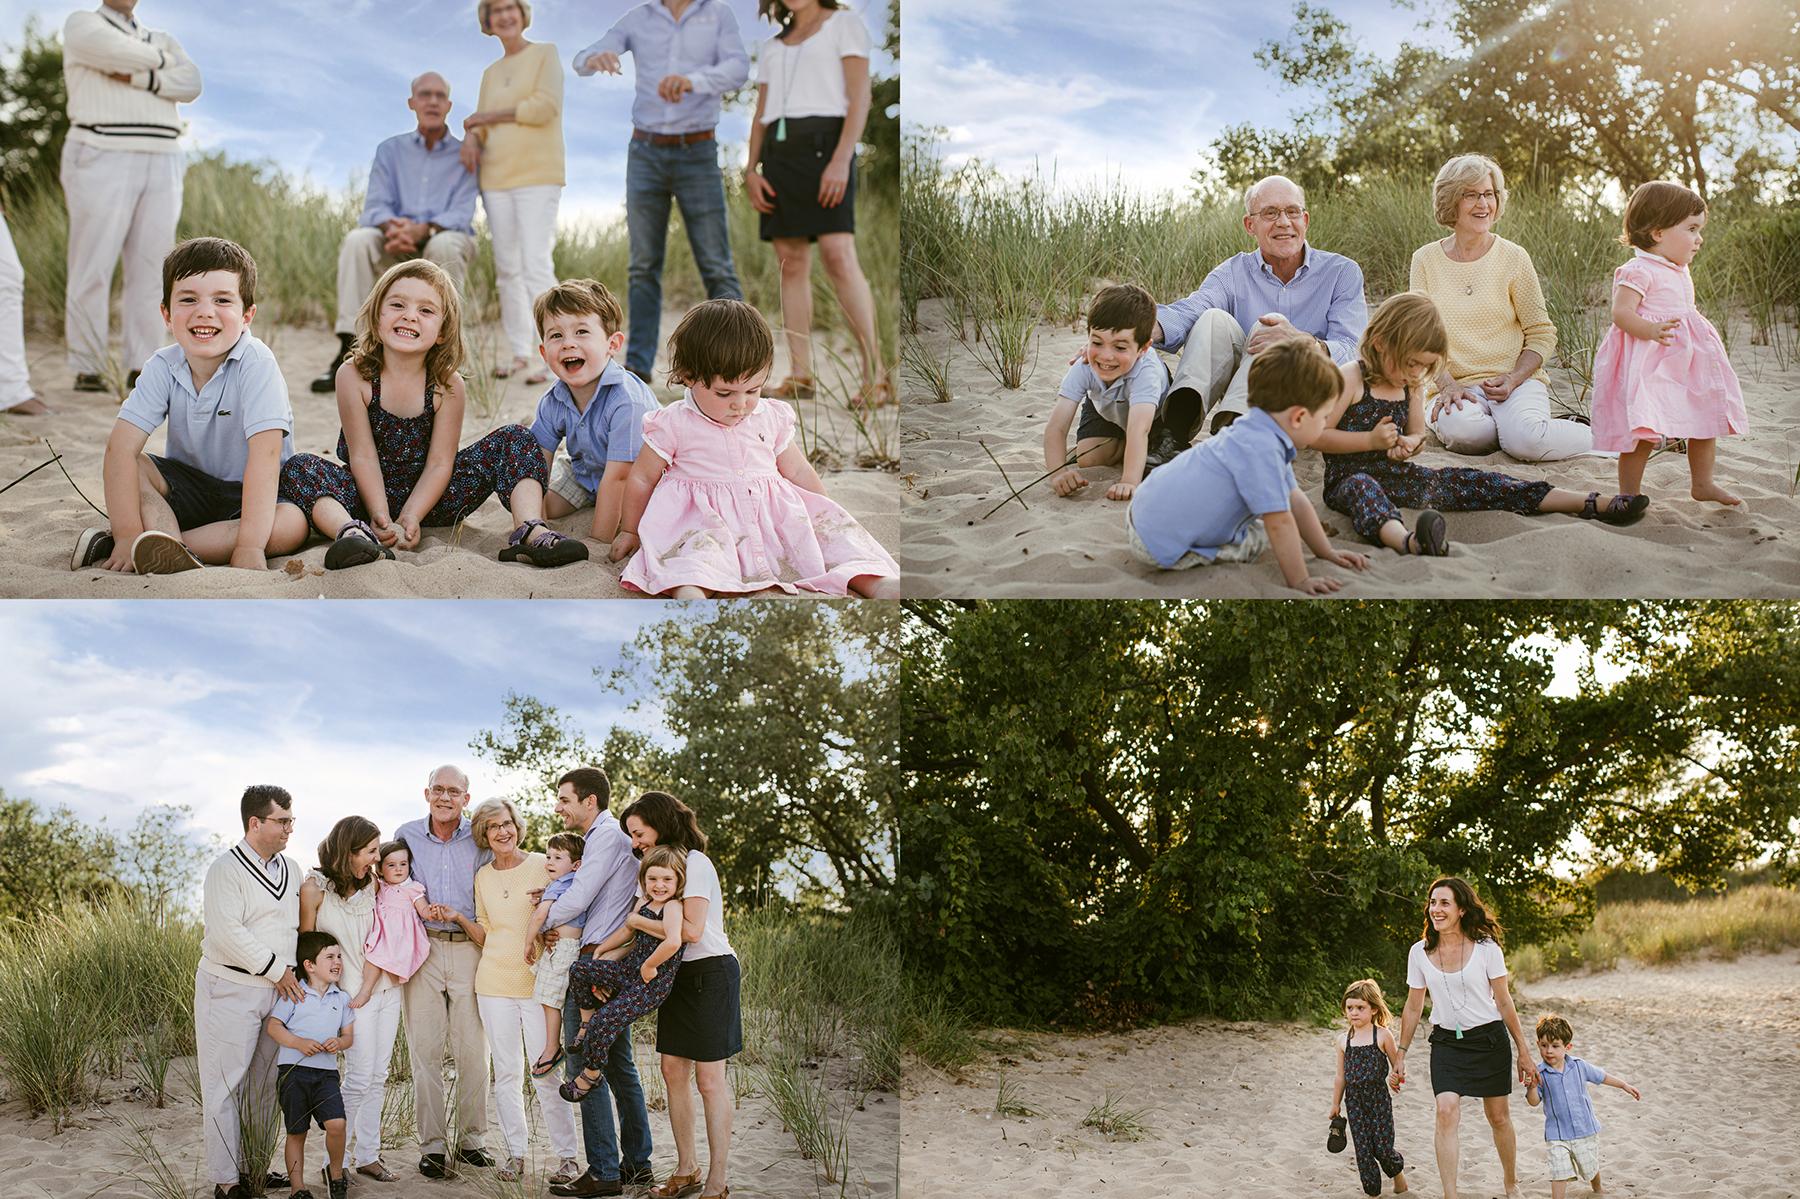 006 lake-michigan-family-session.jpg